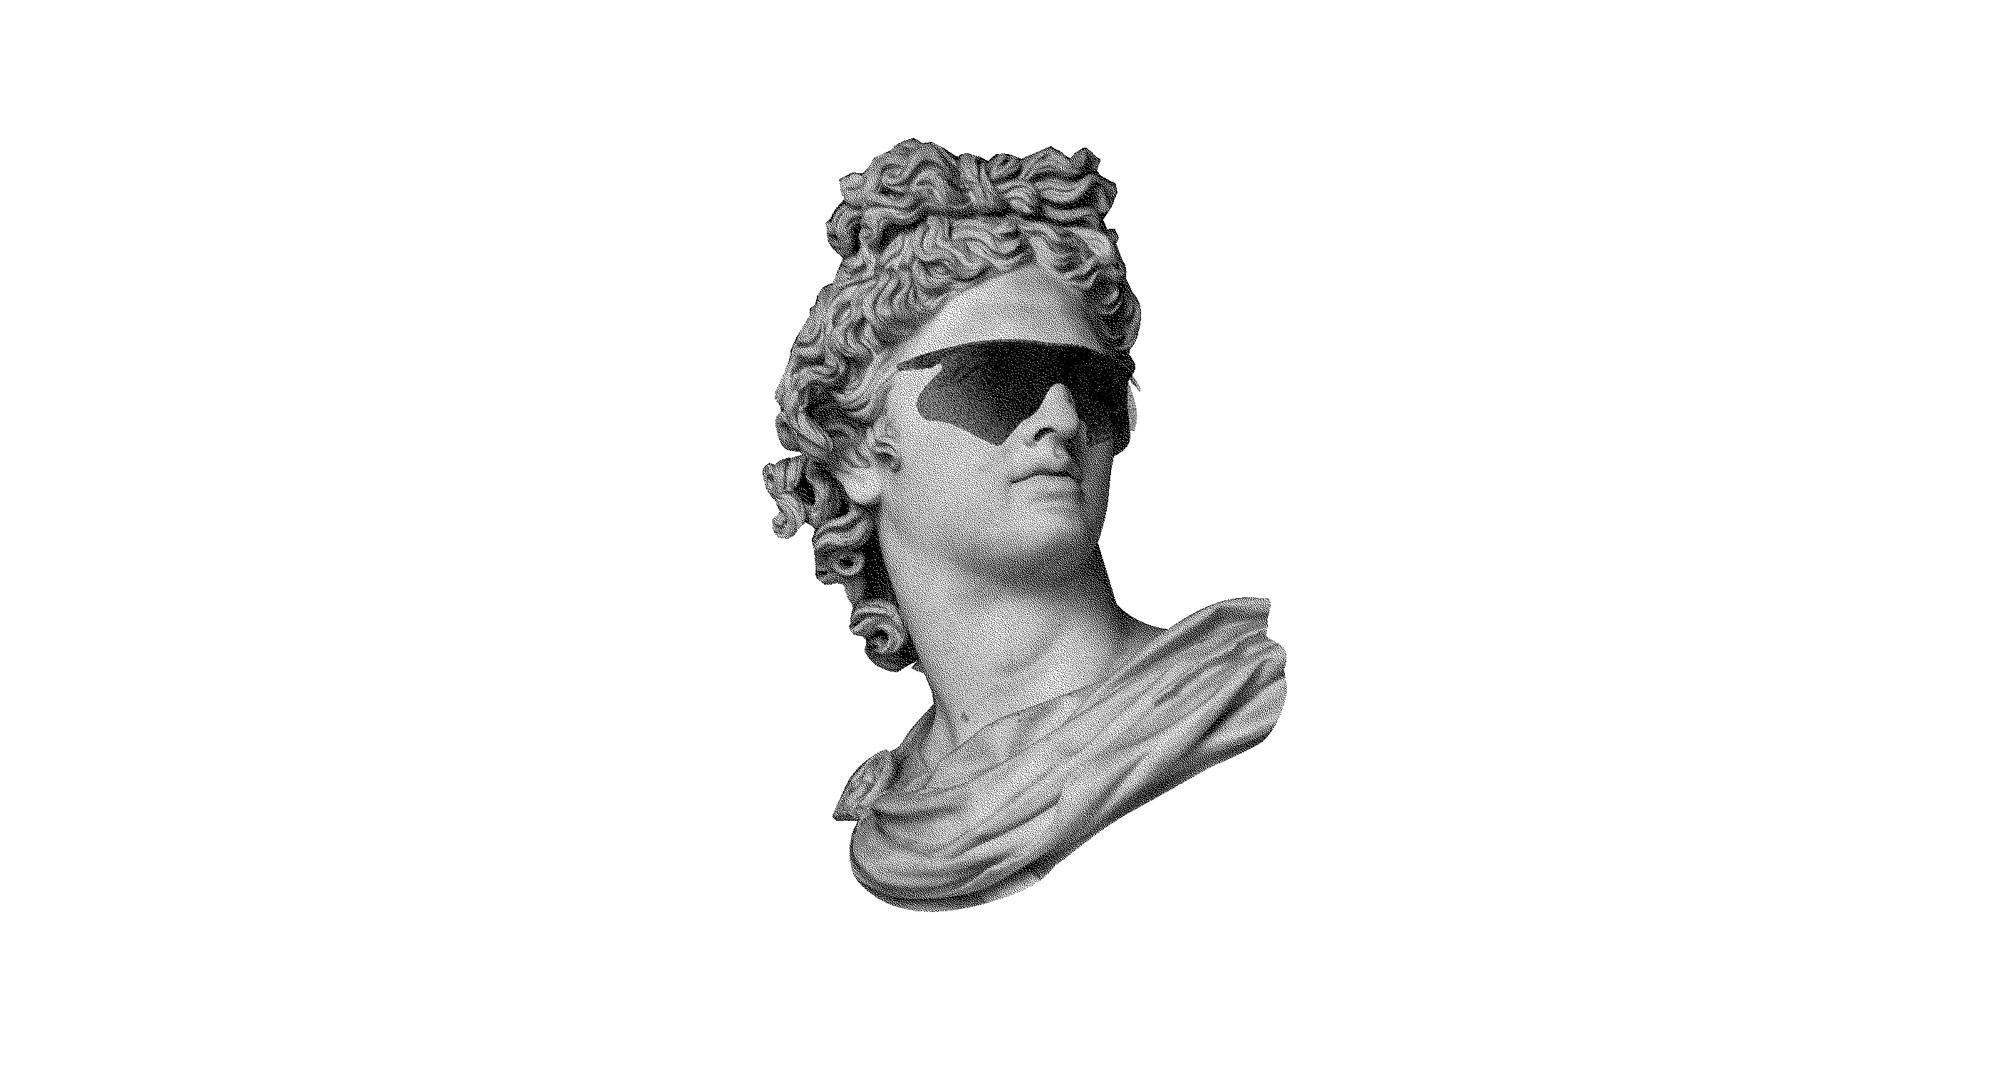 GreekHead_shades.jpg